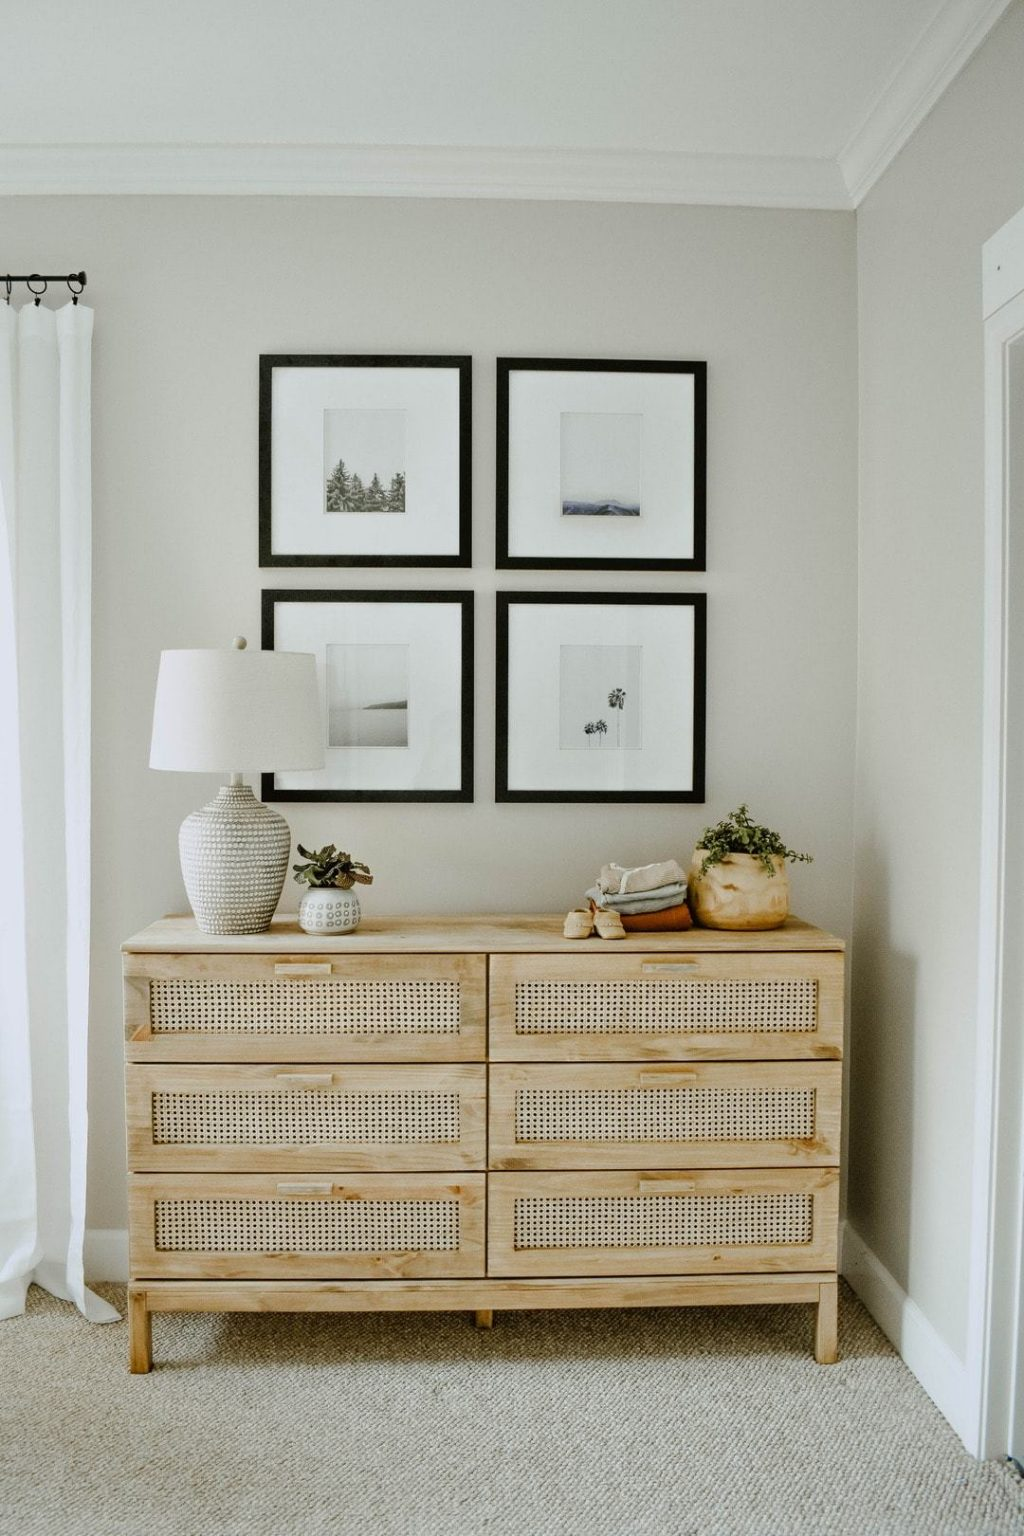 20 Ikea Tarva Dresser DIY Hacks